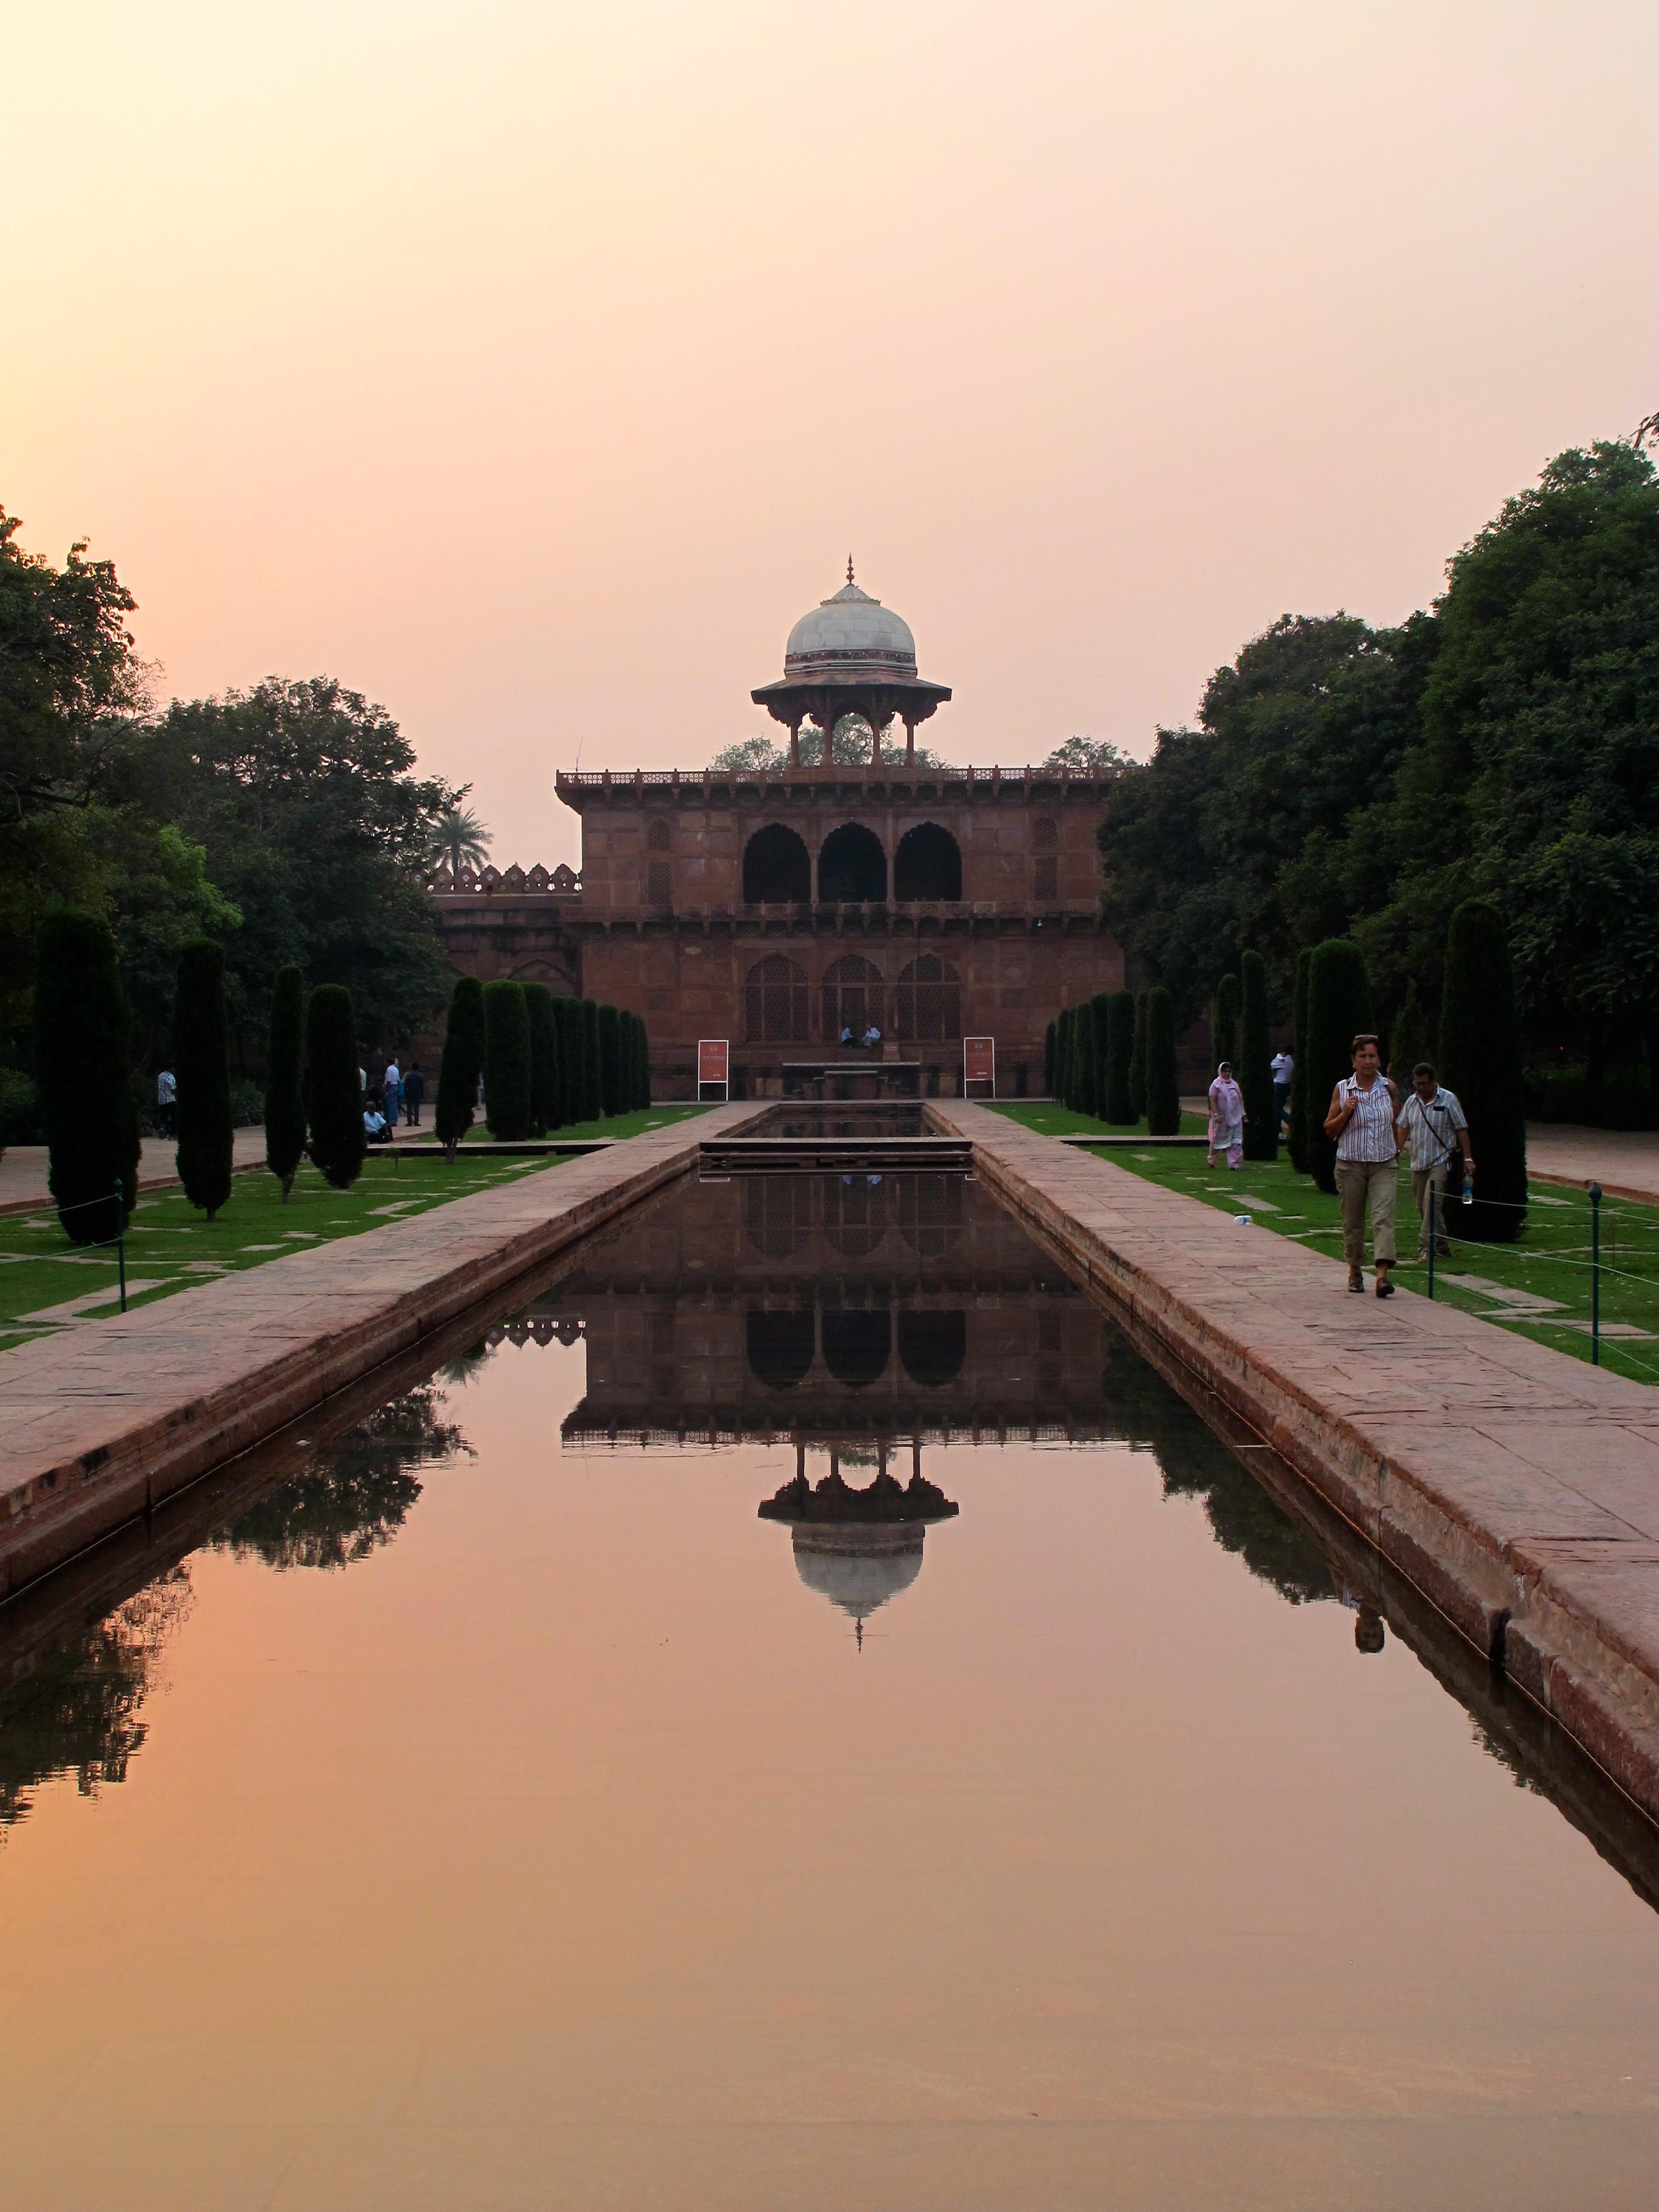 Tomb - Taj Mahal - Agra - India